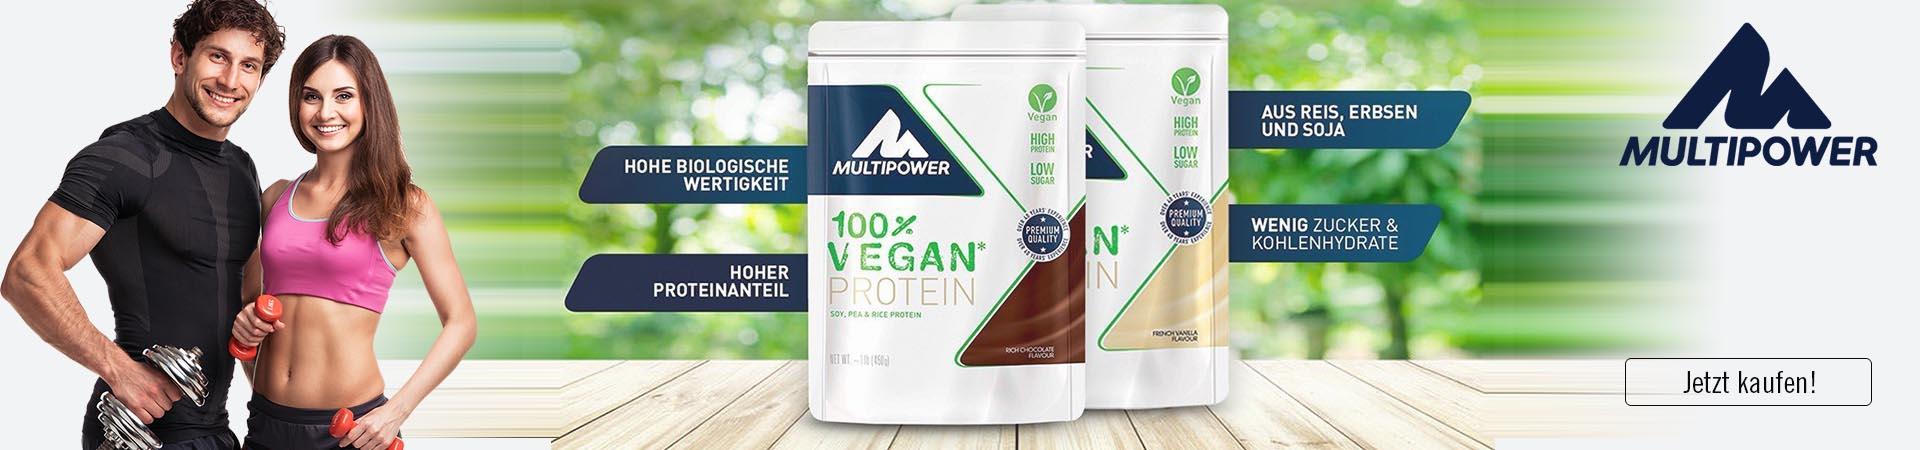 Multipower 100% Vegan ...